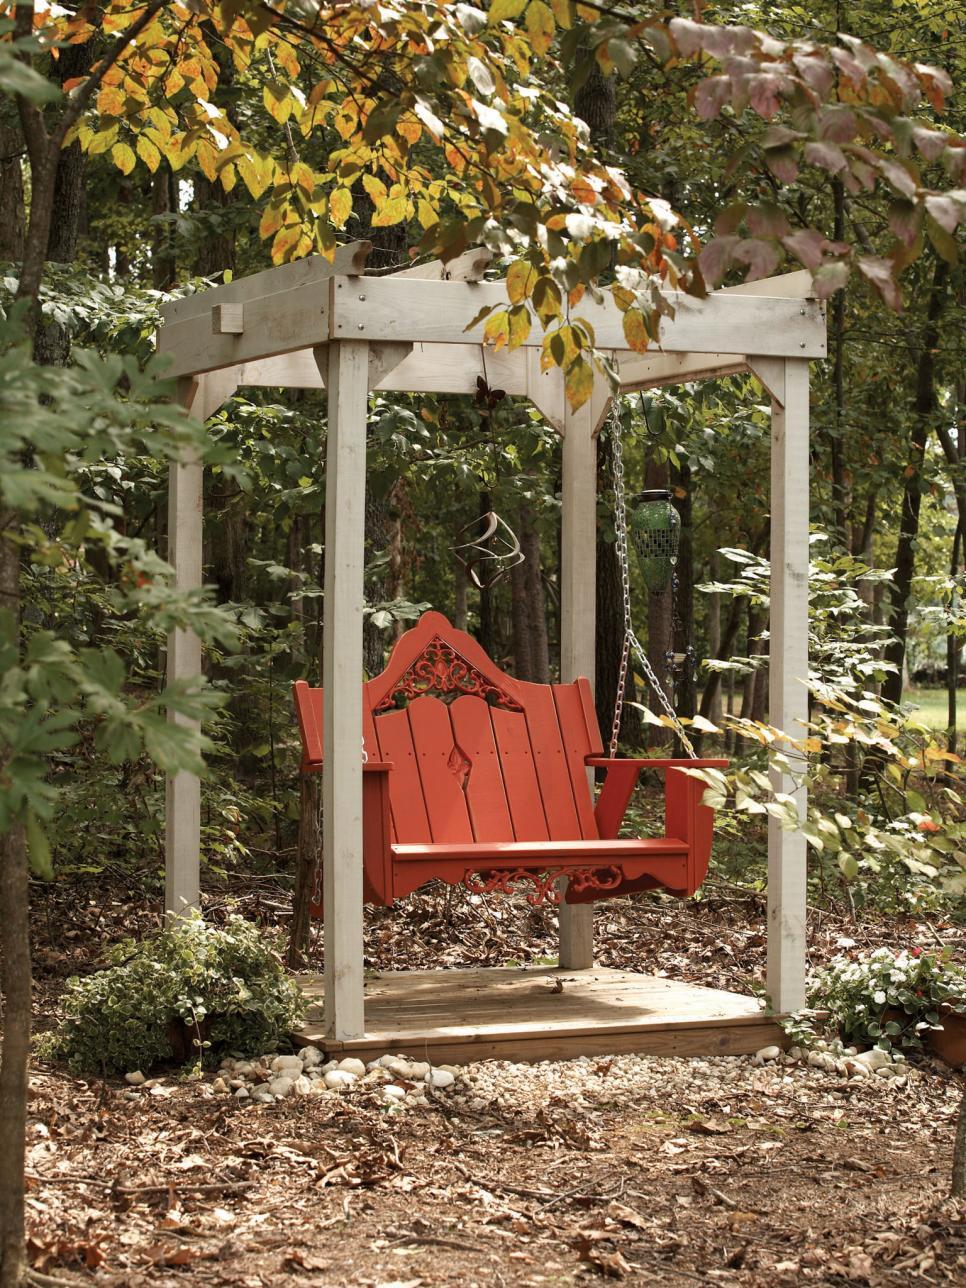 Fairytale-like-garden-among-the-trees-